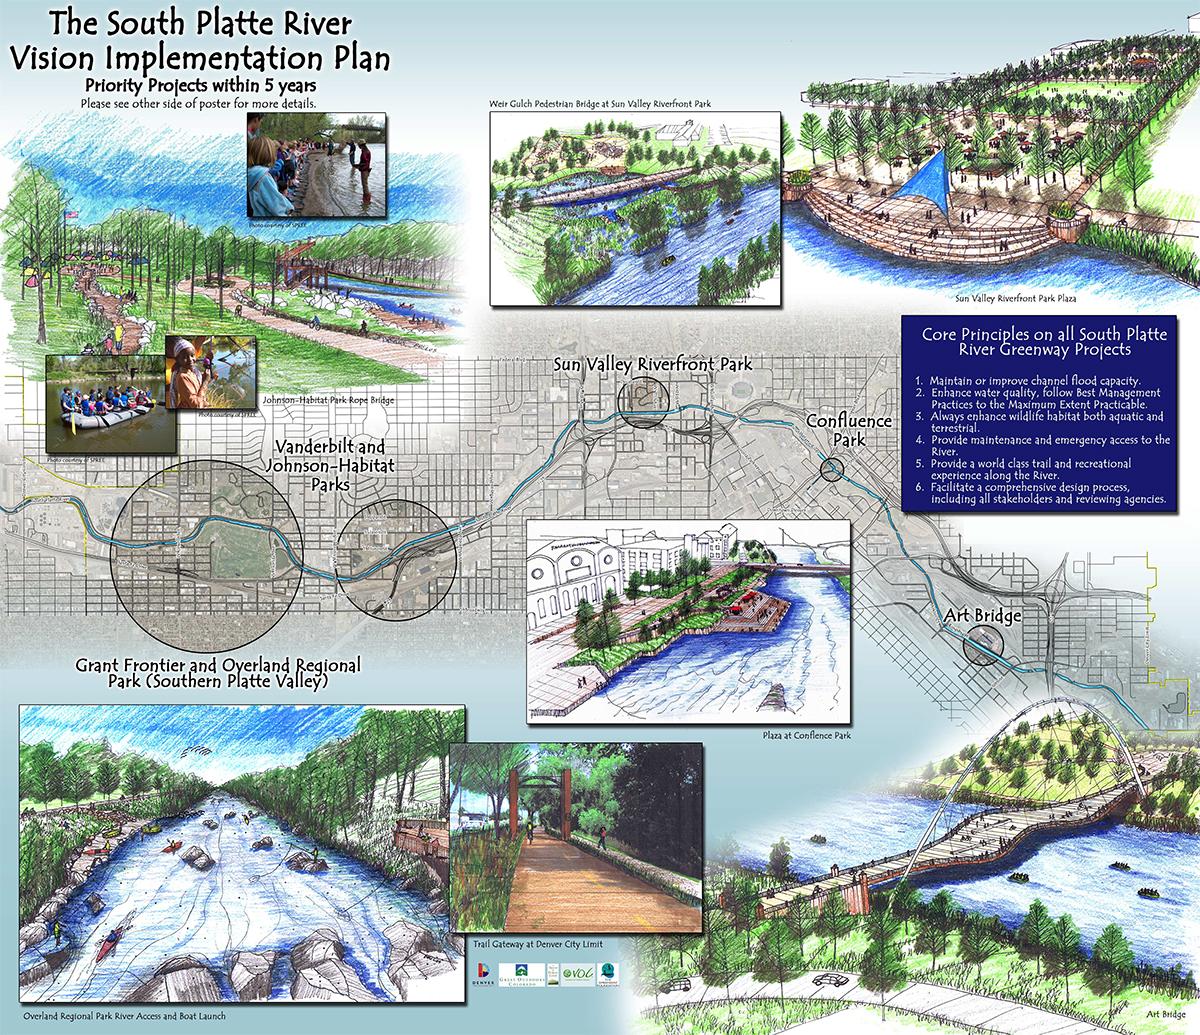 River Vision Implementation Plan